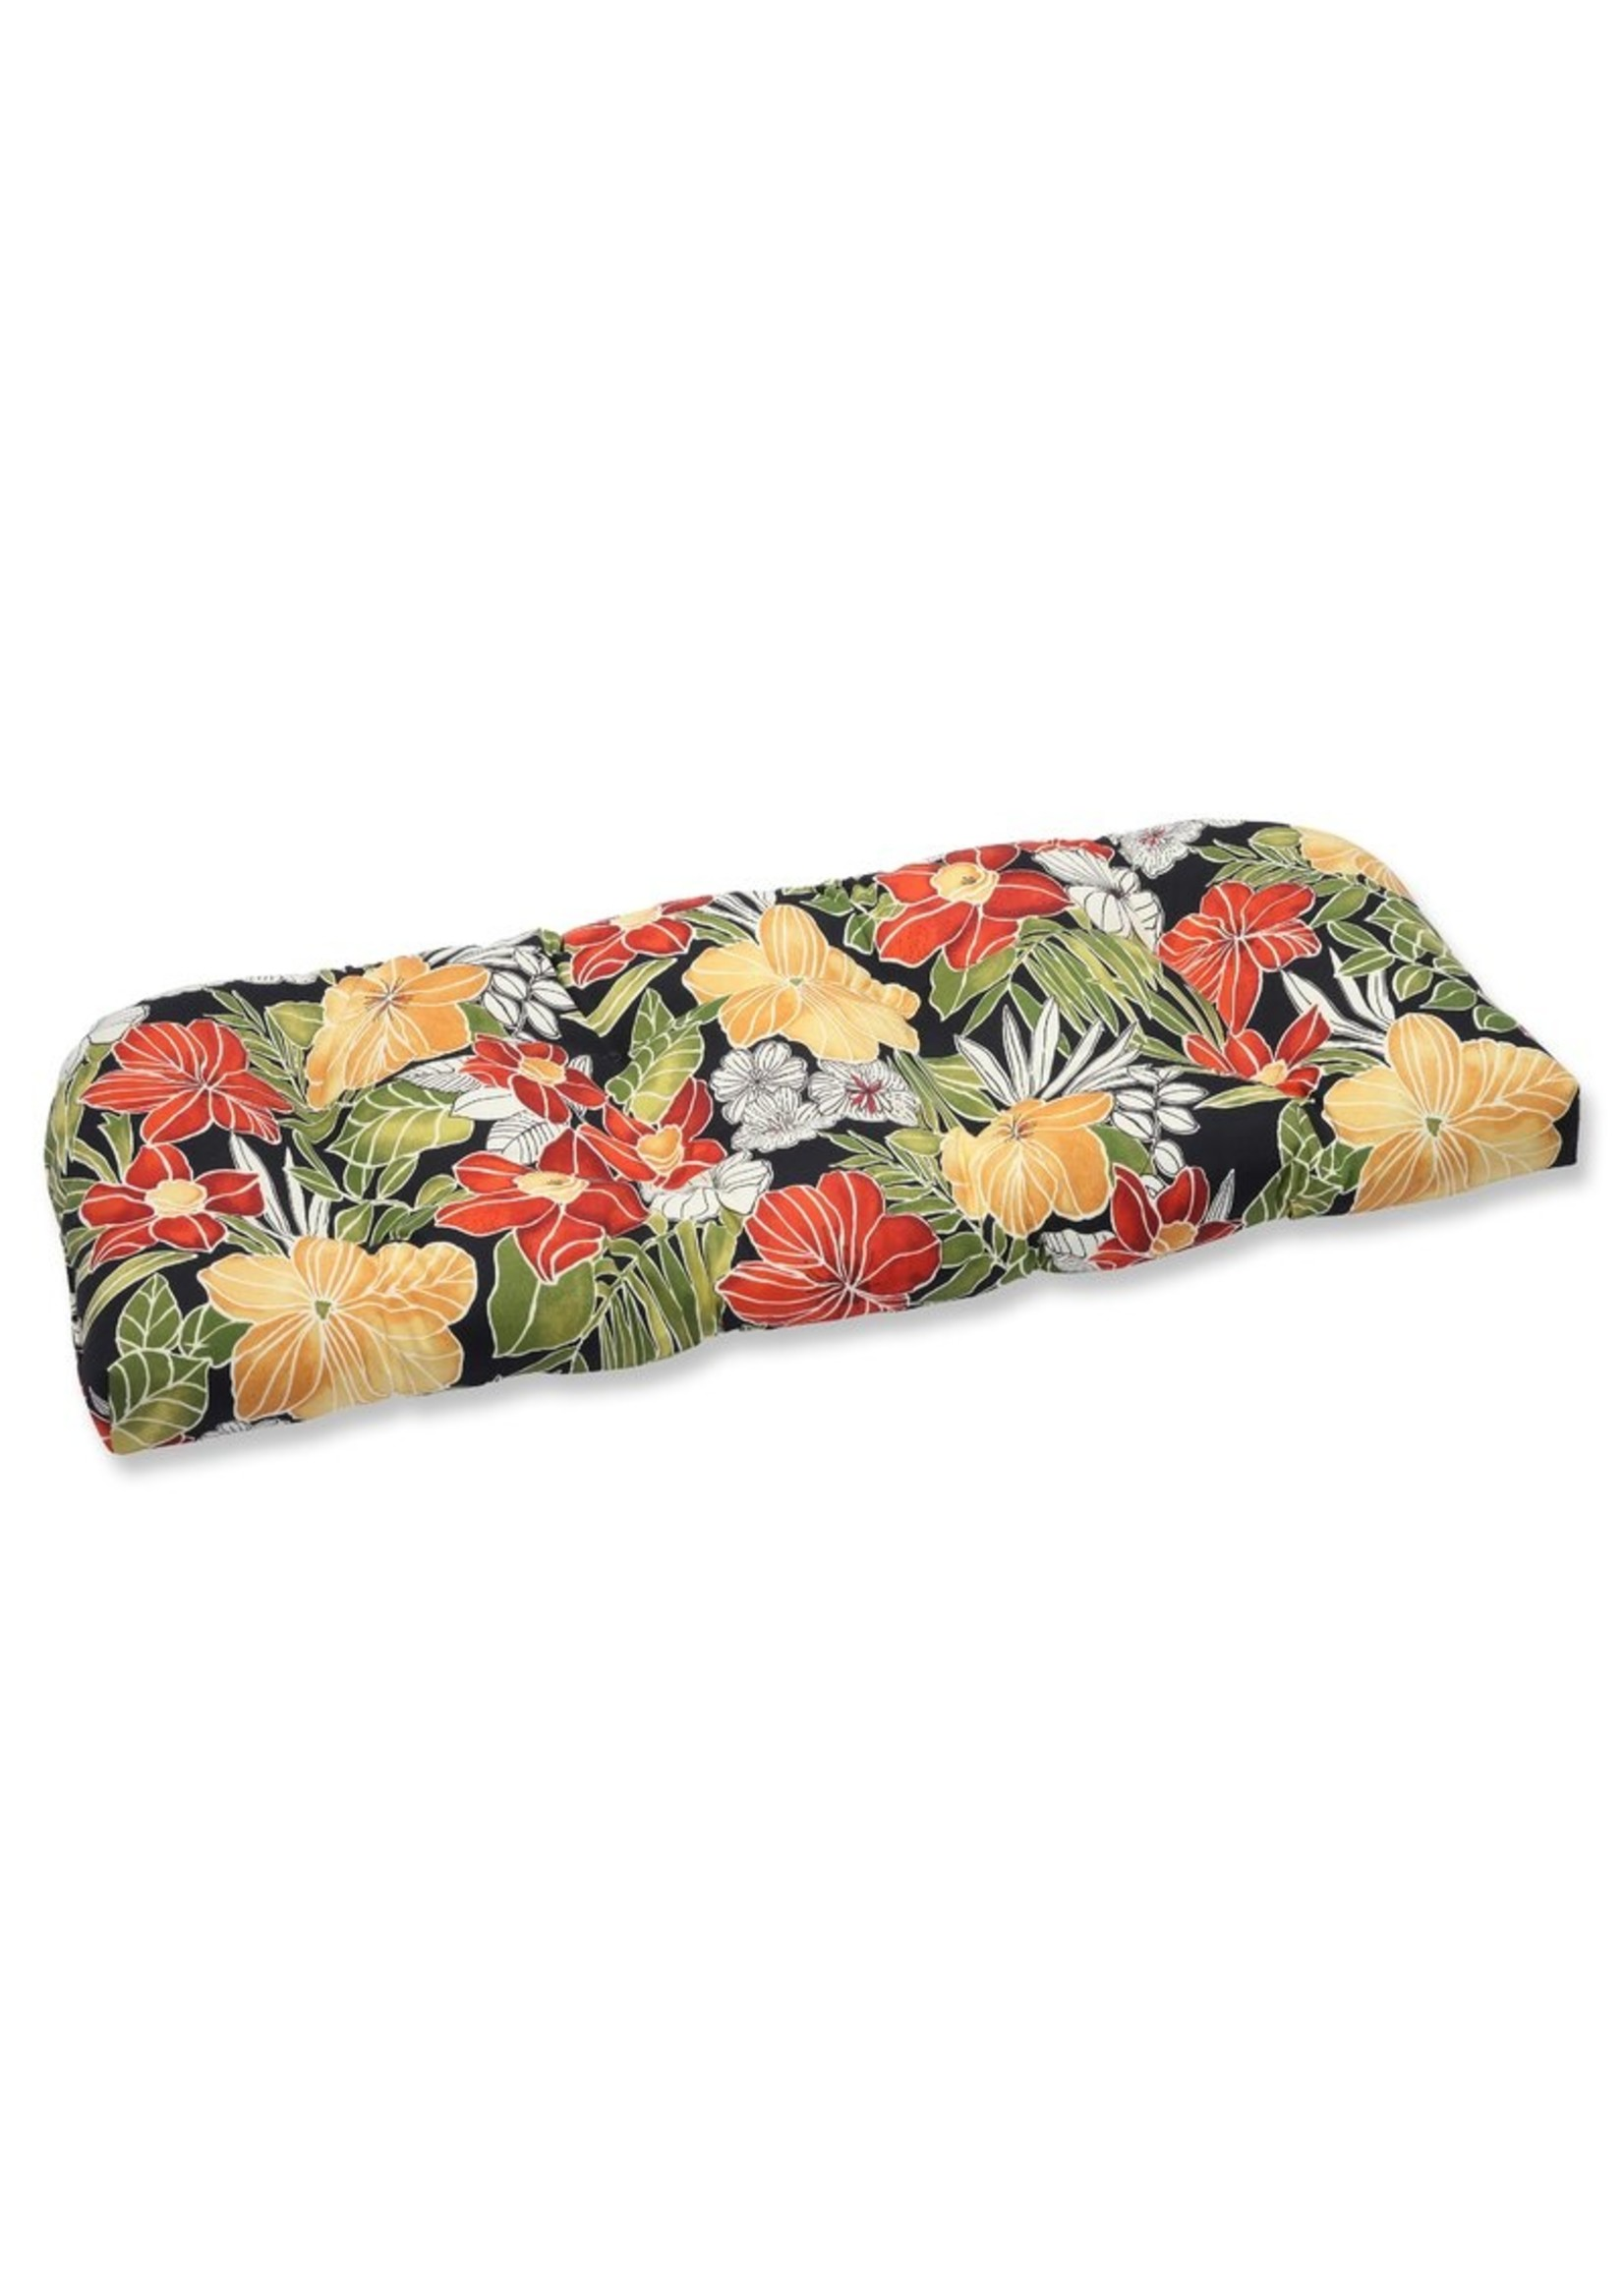 *Paislee Indoor/Outdoor Loveseat Cushion - Final Sale